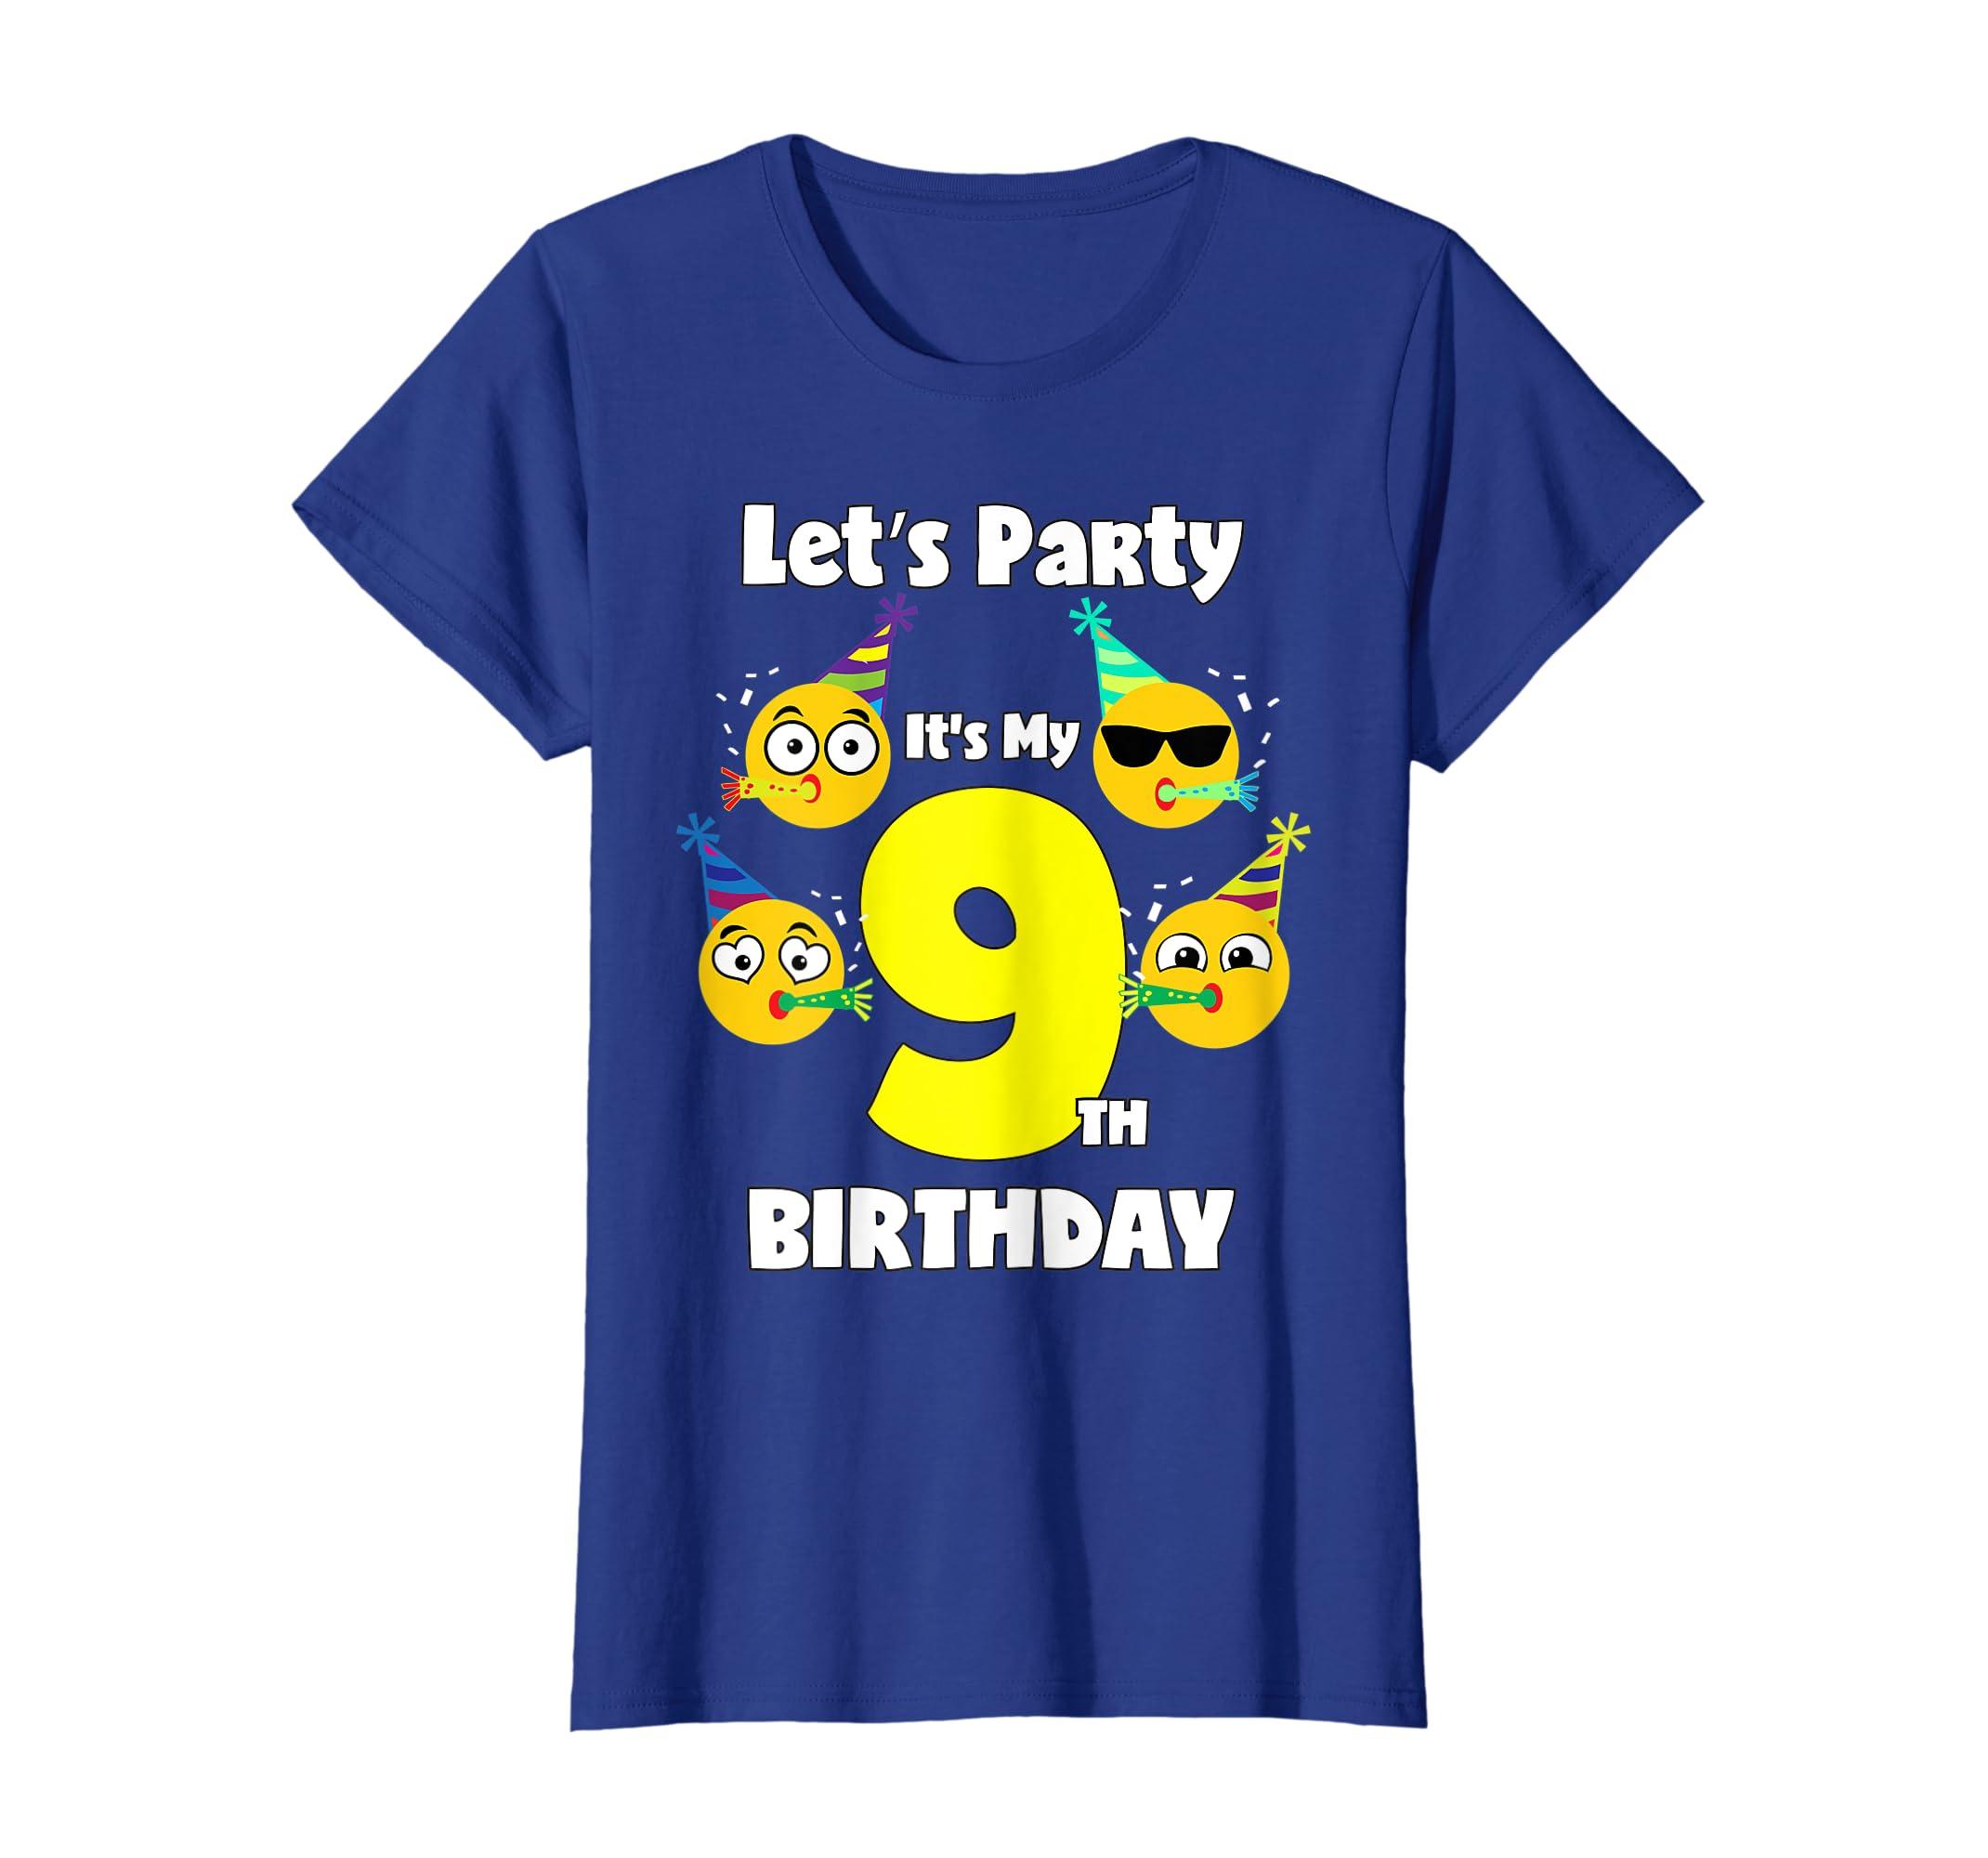 Amazon Emoji Birthday Shirt For 9 Year Old Girl Boy Toddler Cute Clothing